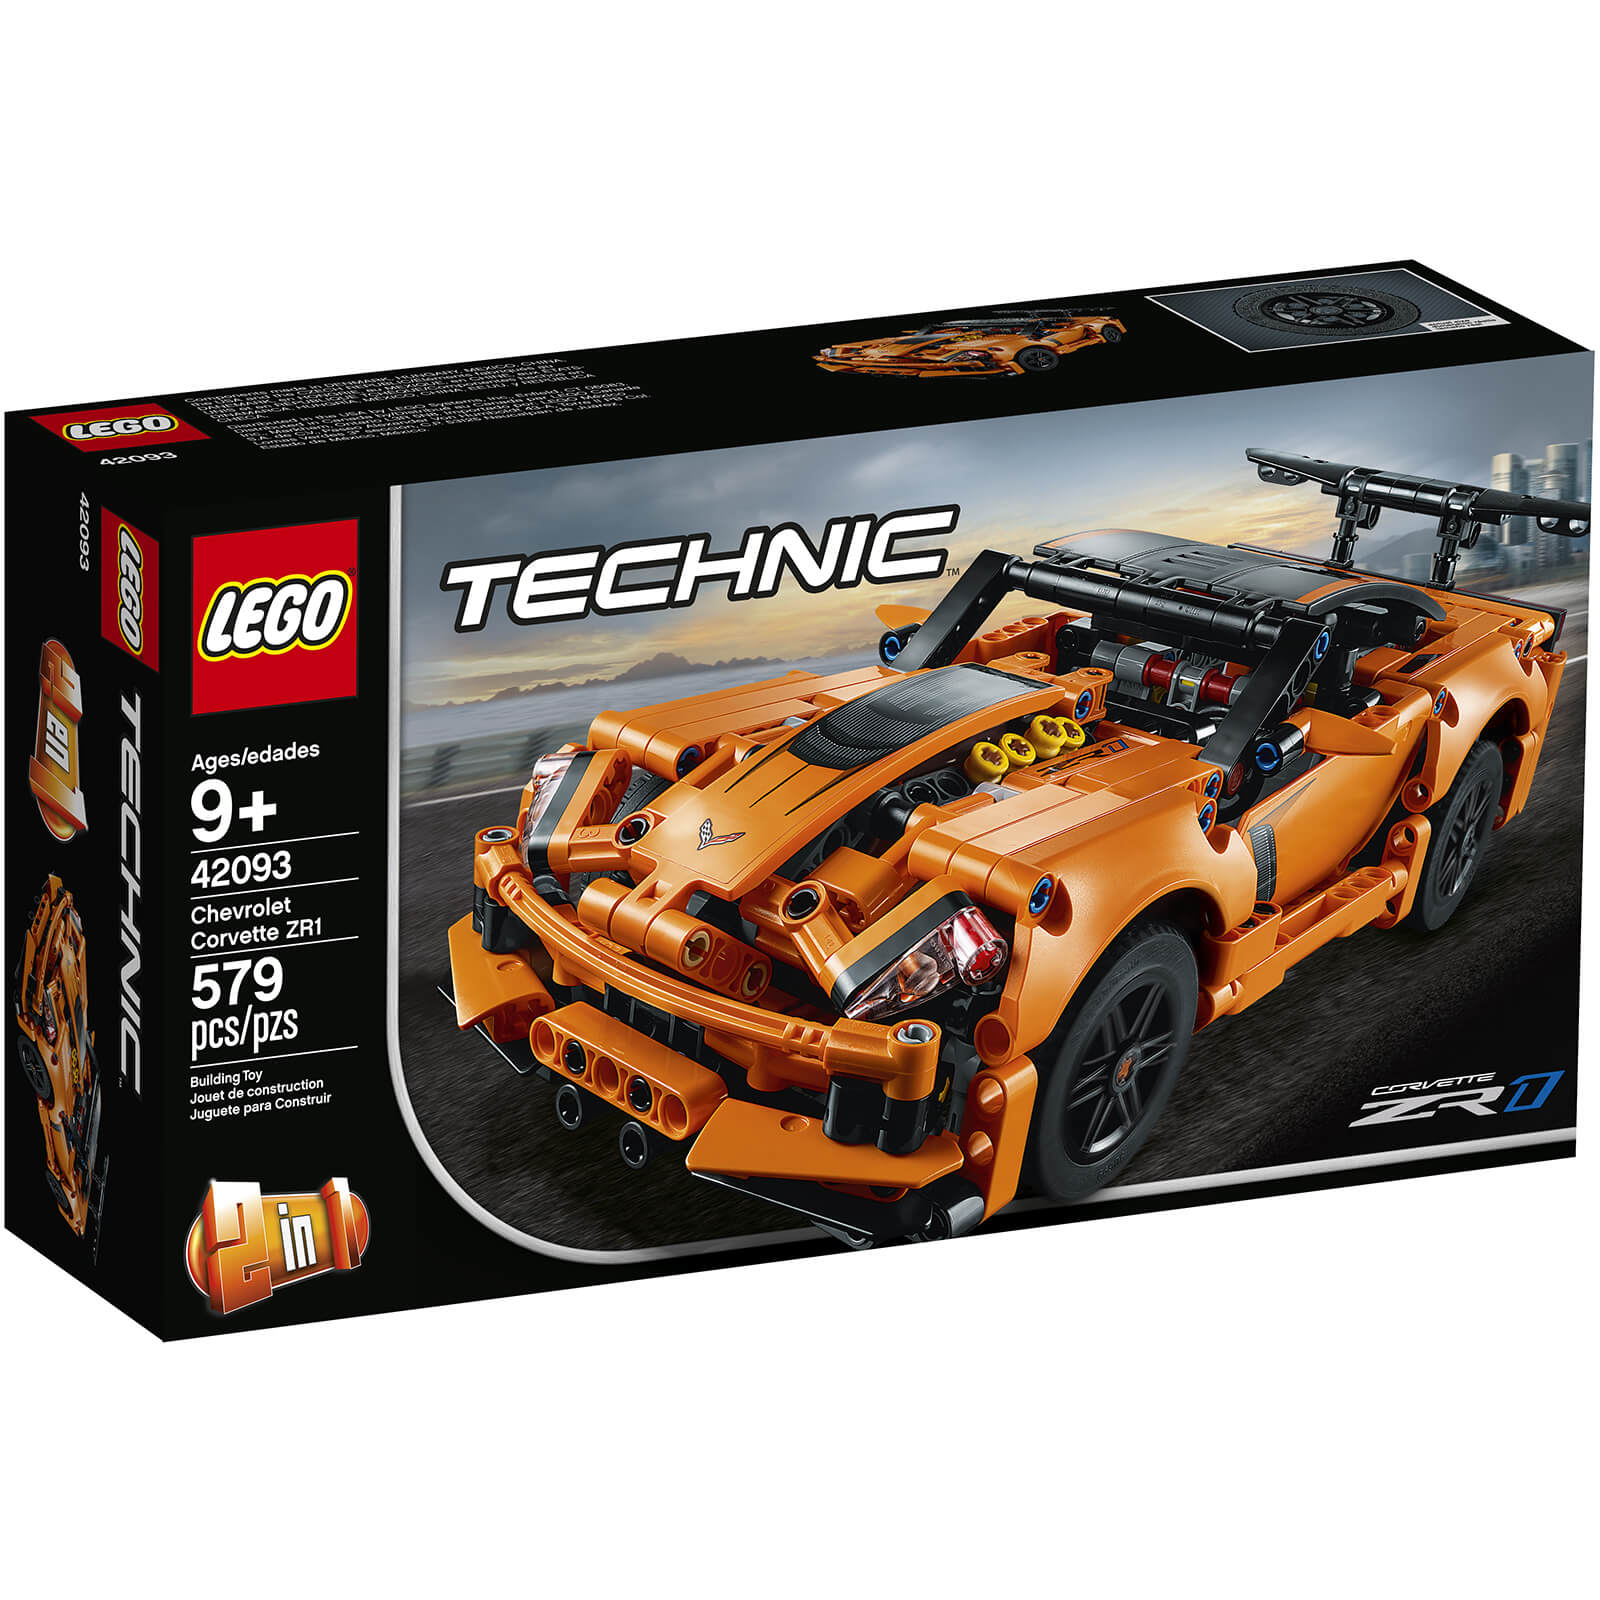 Image of 42093 LEGO® TECHNIC Chevrolet Corvette ZR1